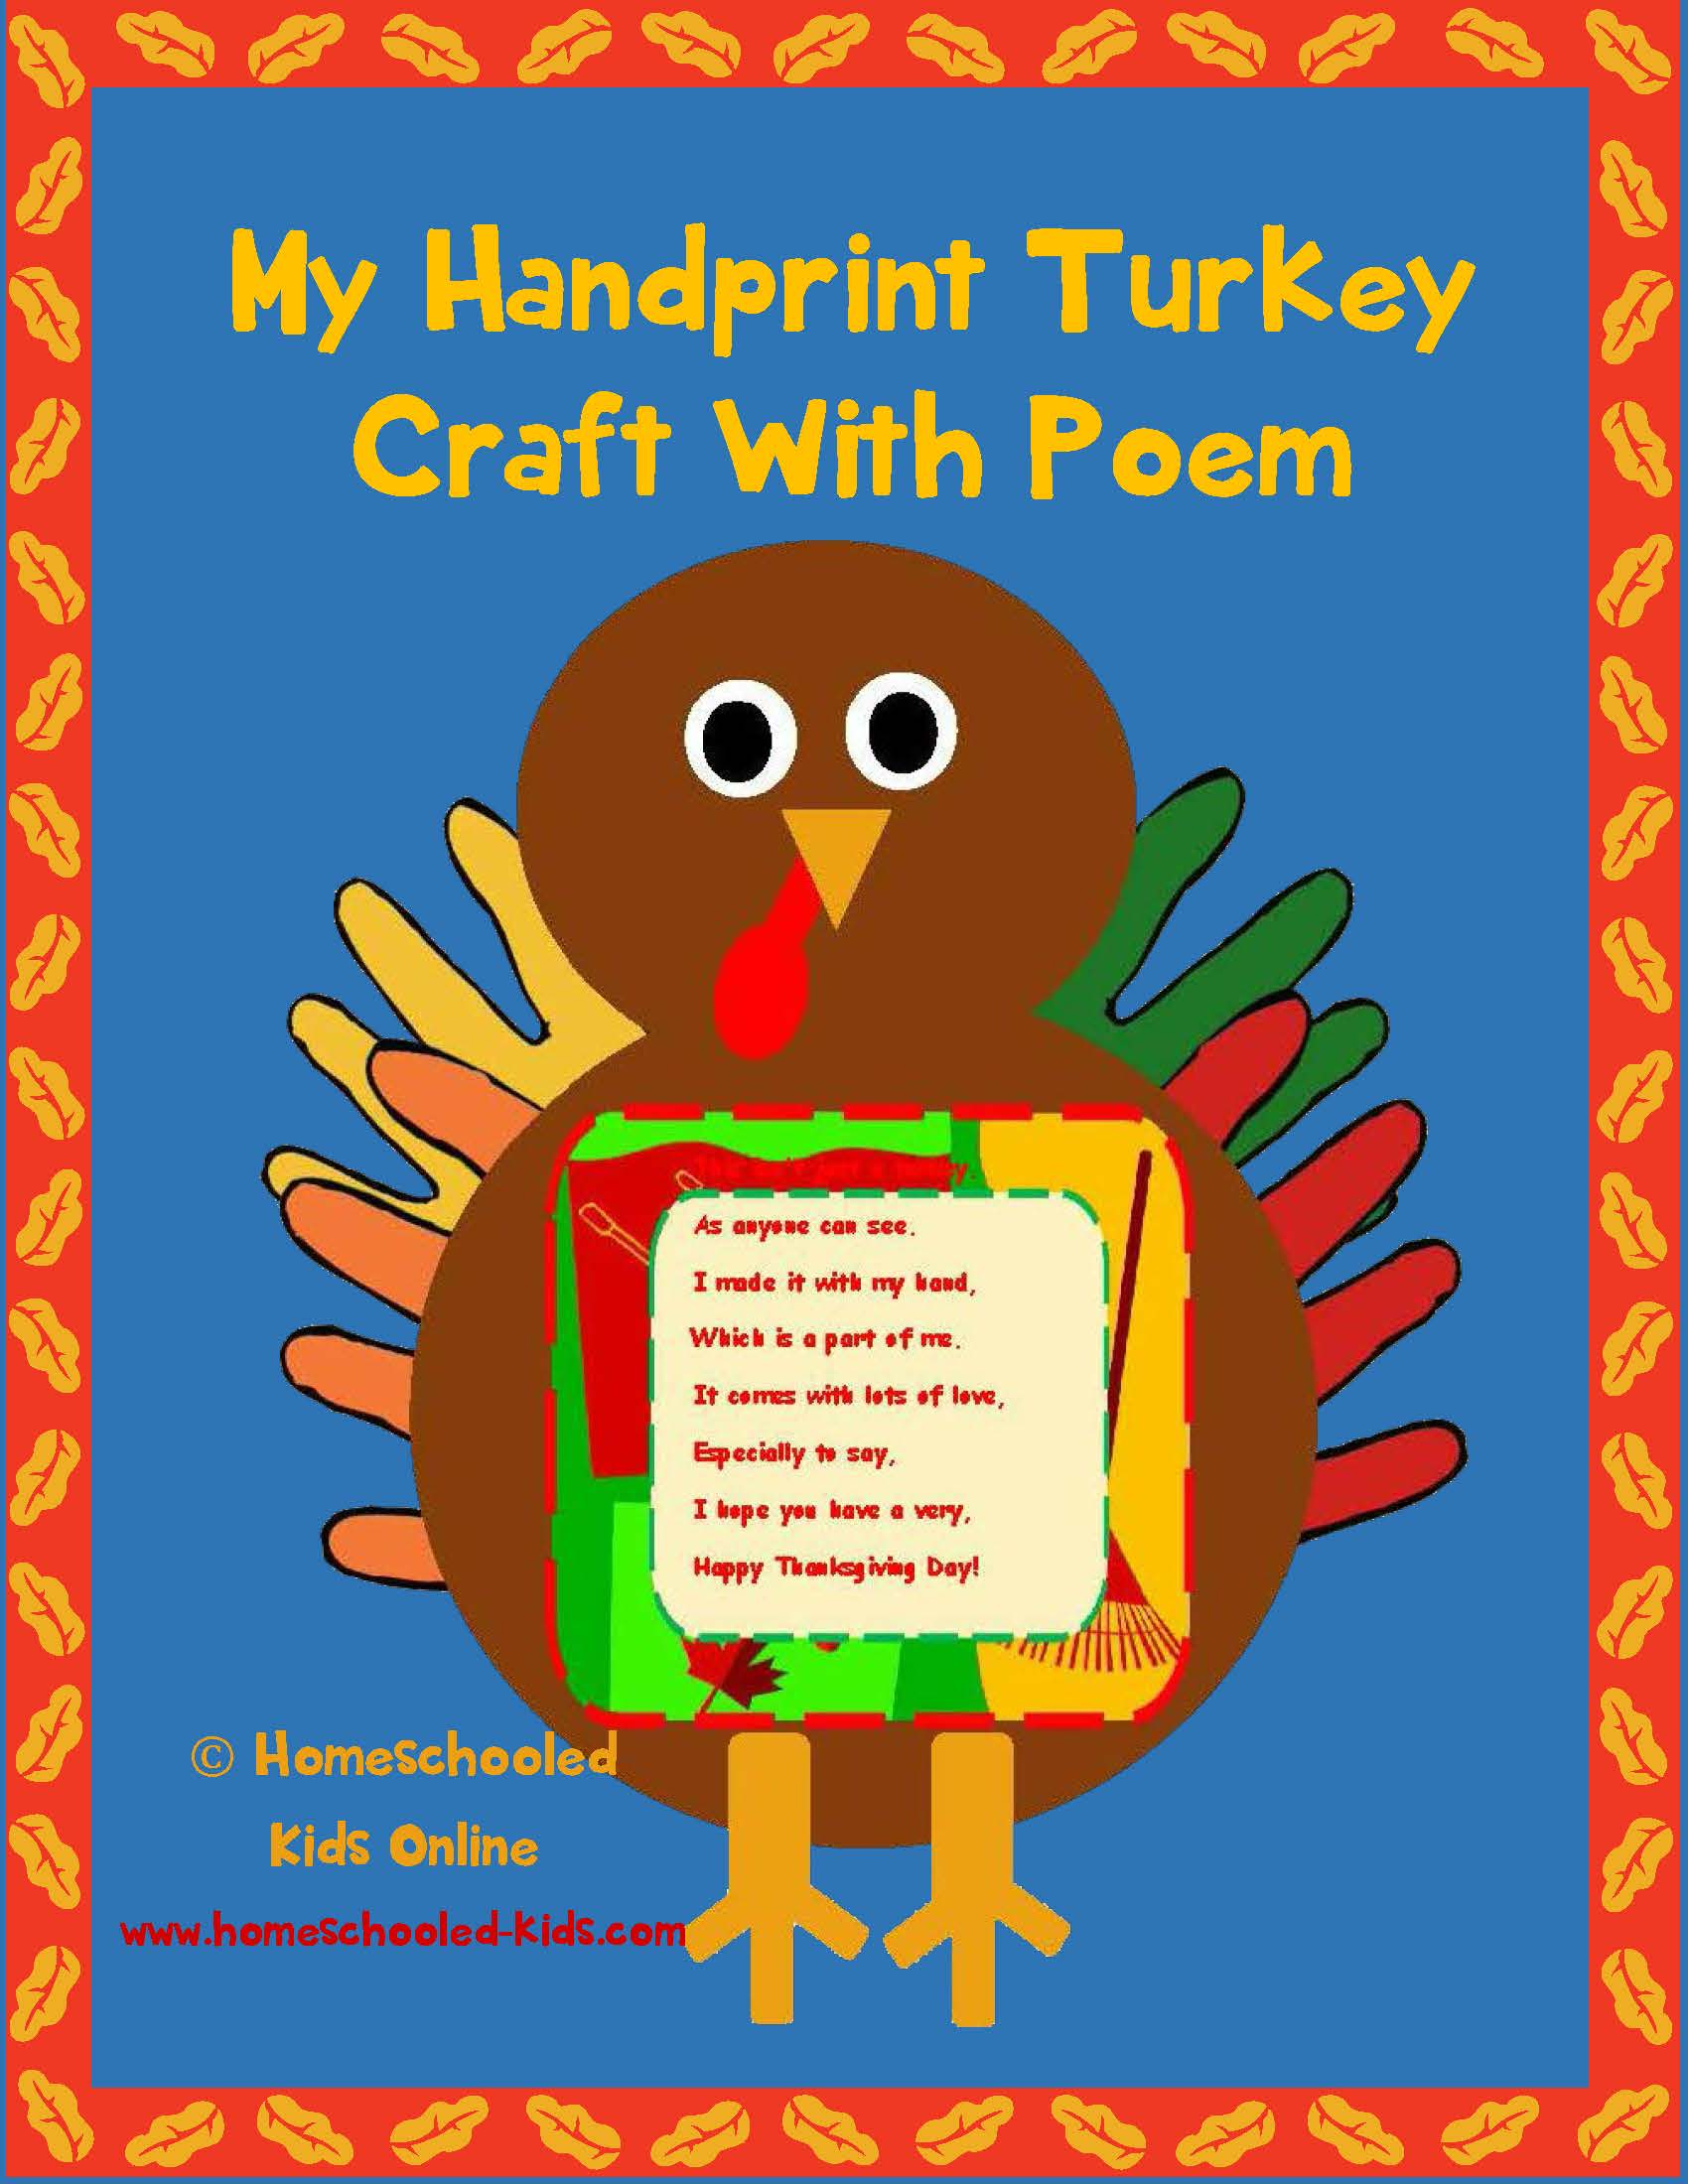 Magazine For Homeschooled Kids Hand Print Turkey Craft